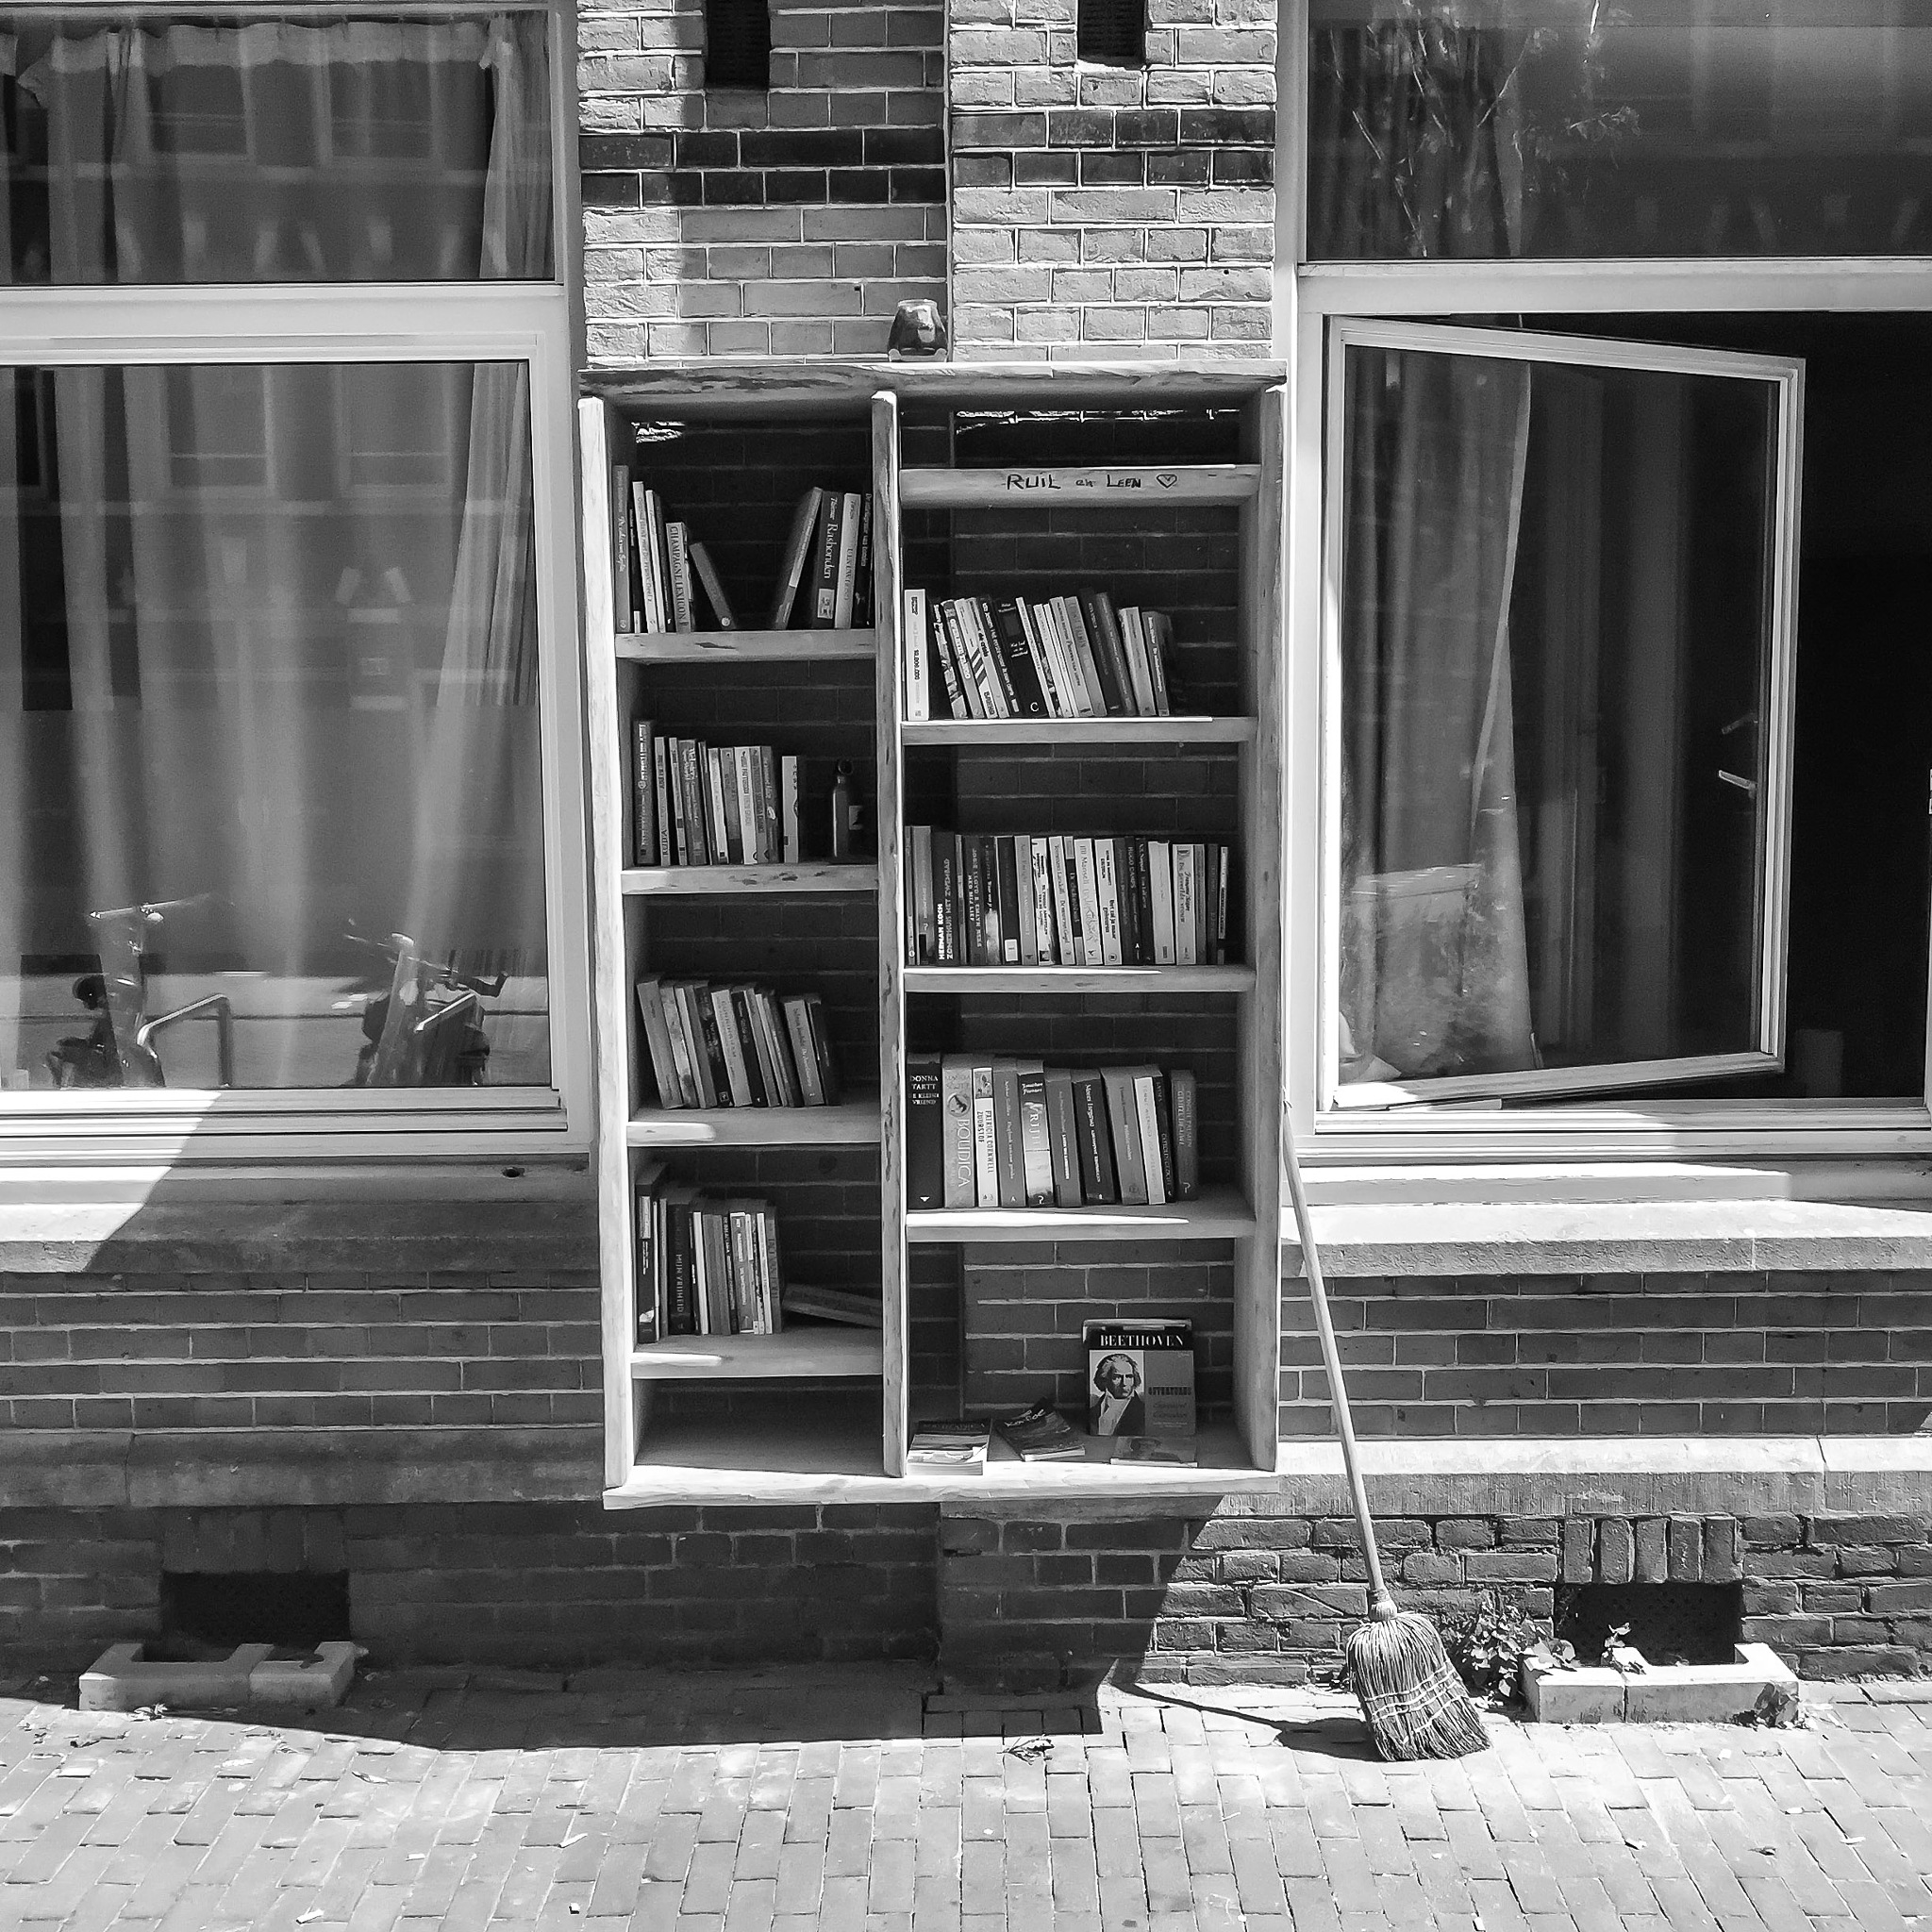 Library 7 by Rob Stegenga